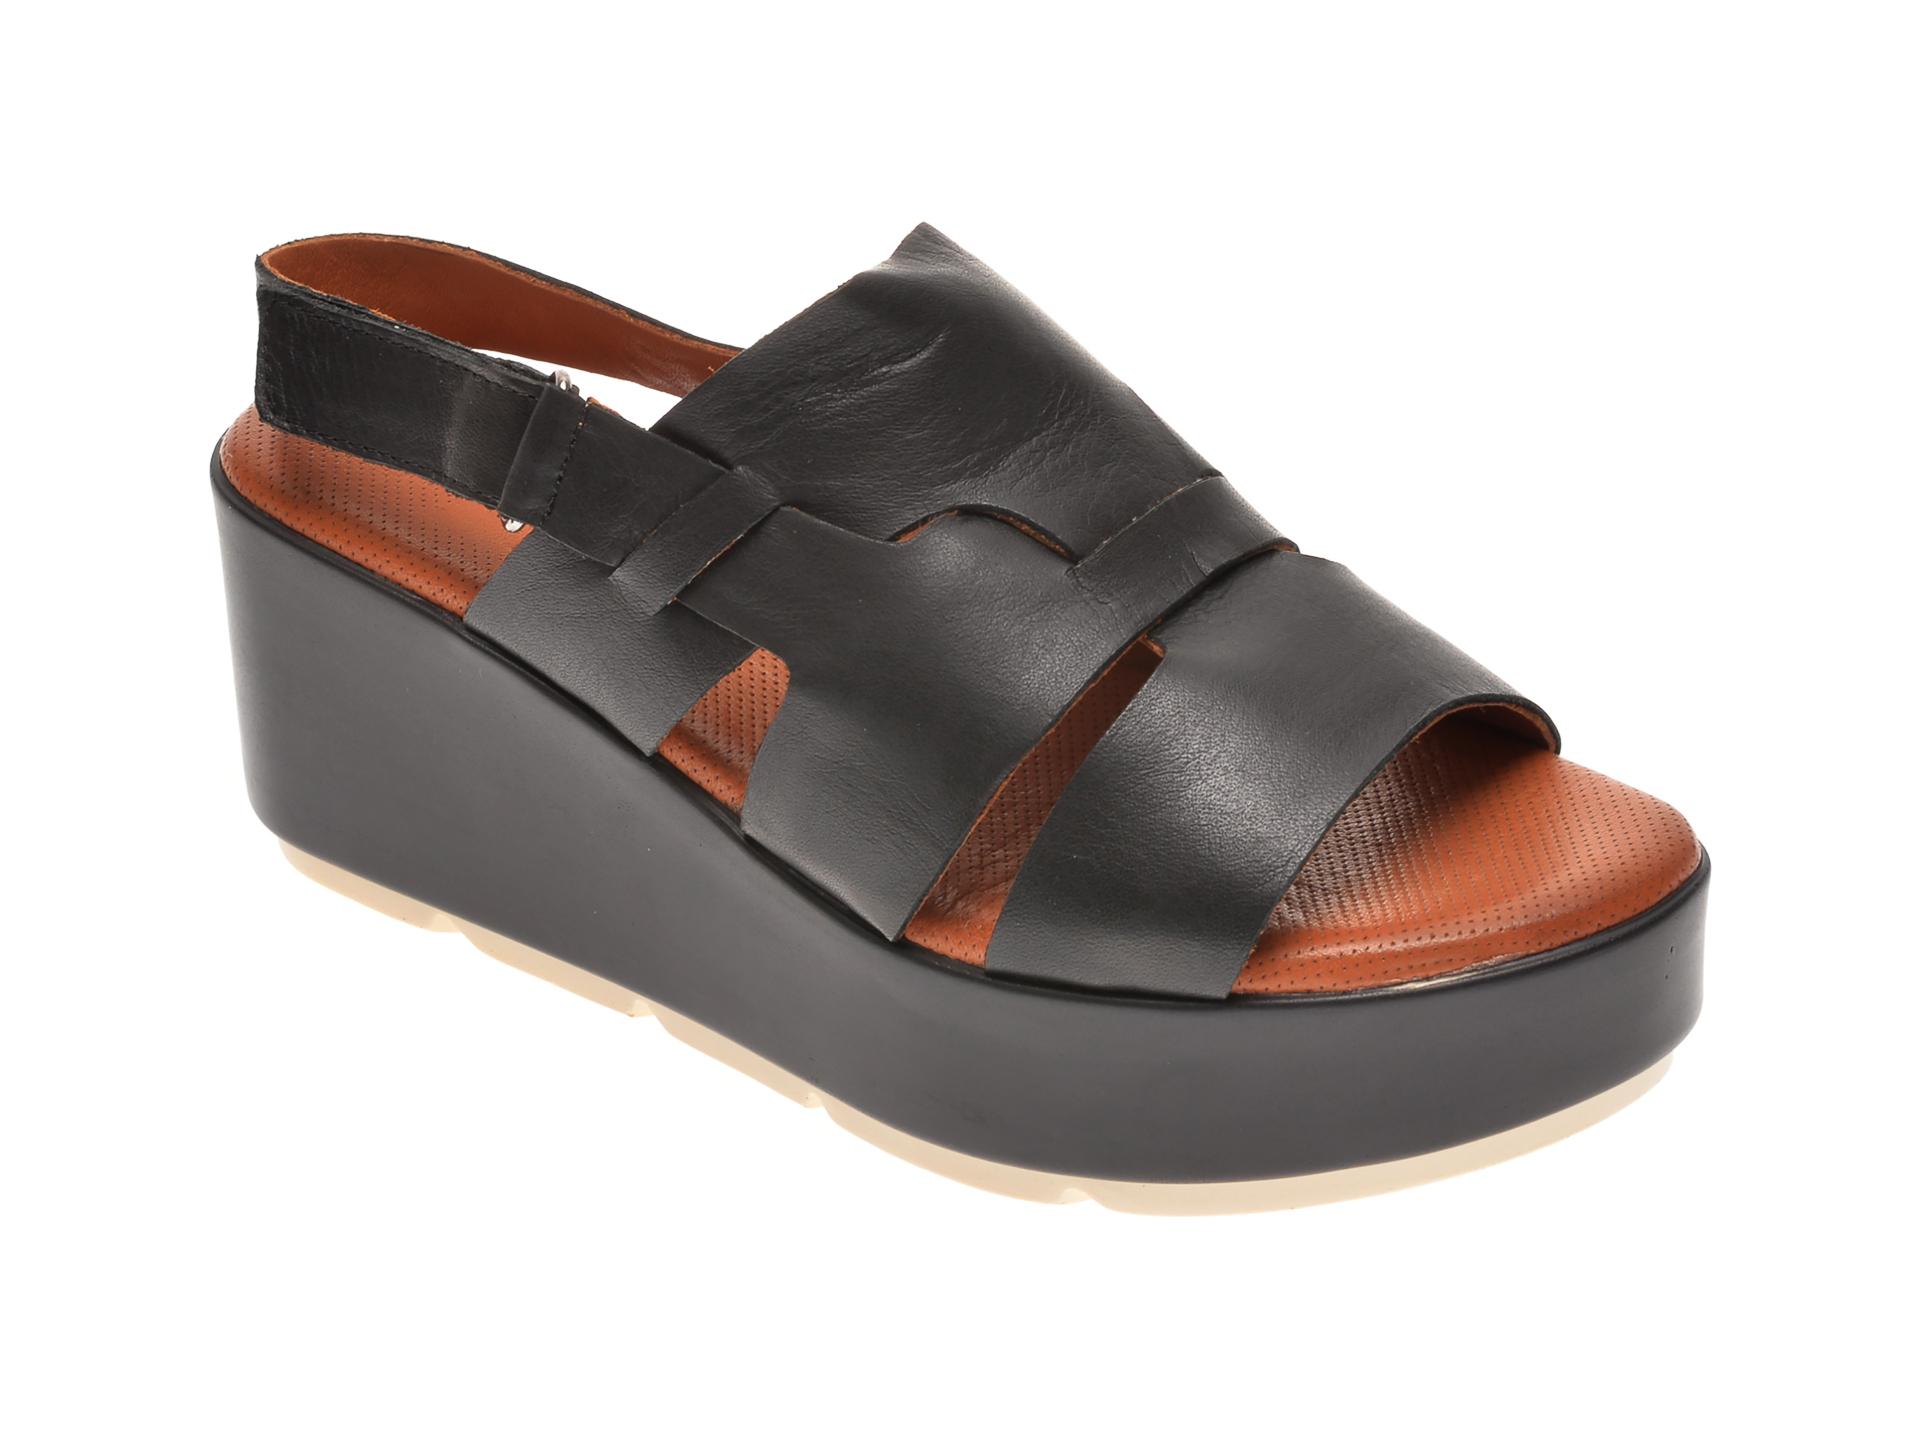 Sandale BABOOS negre, 2519, din piele naturala imagine